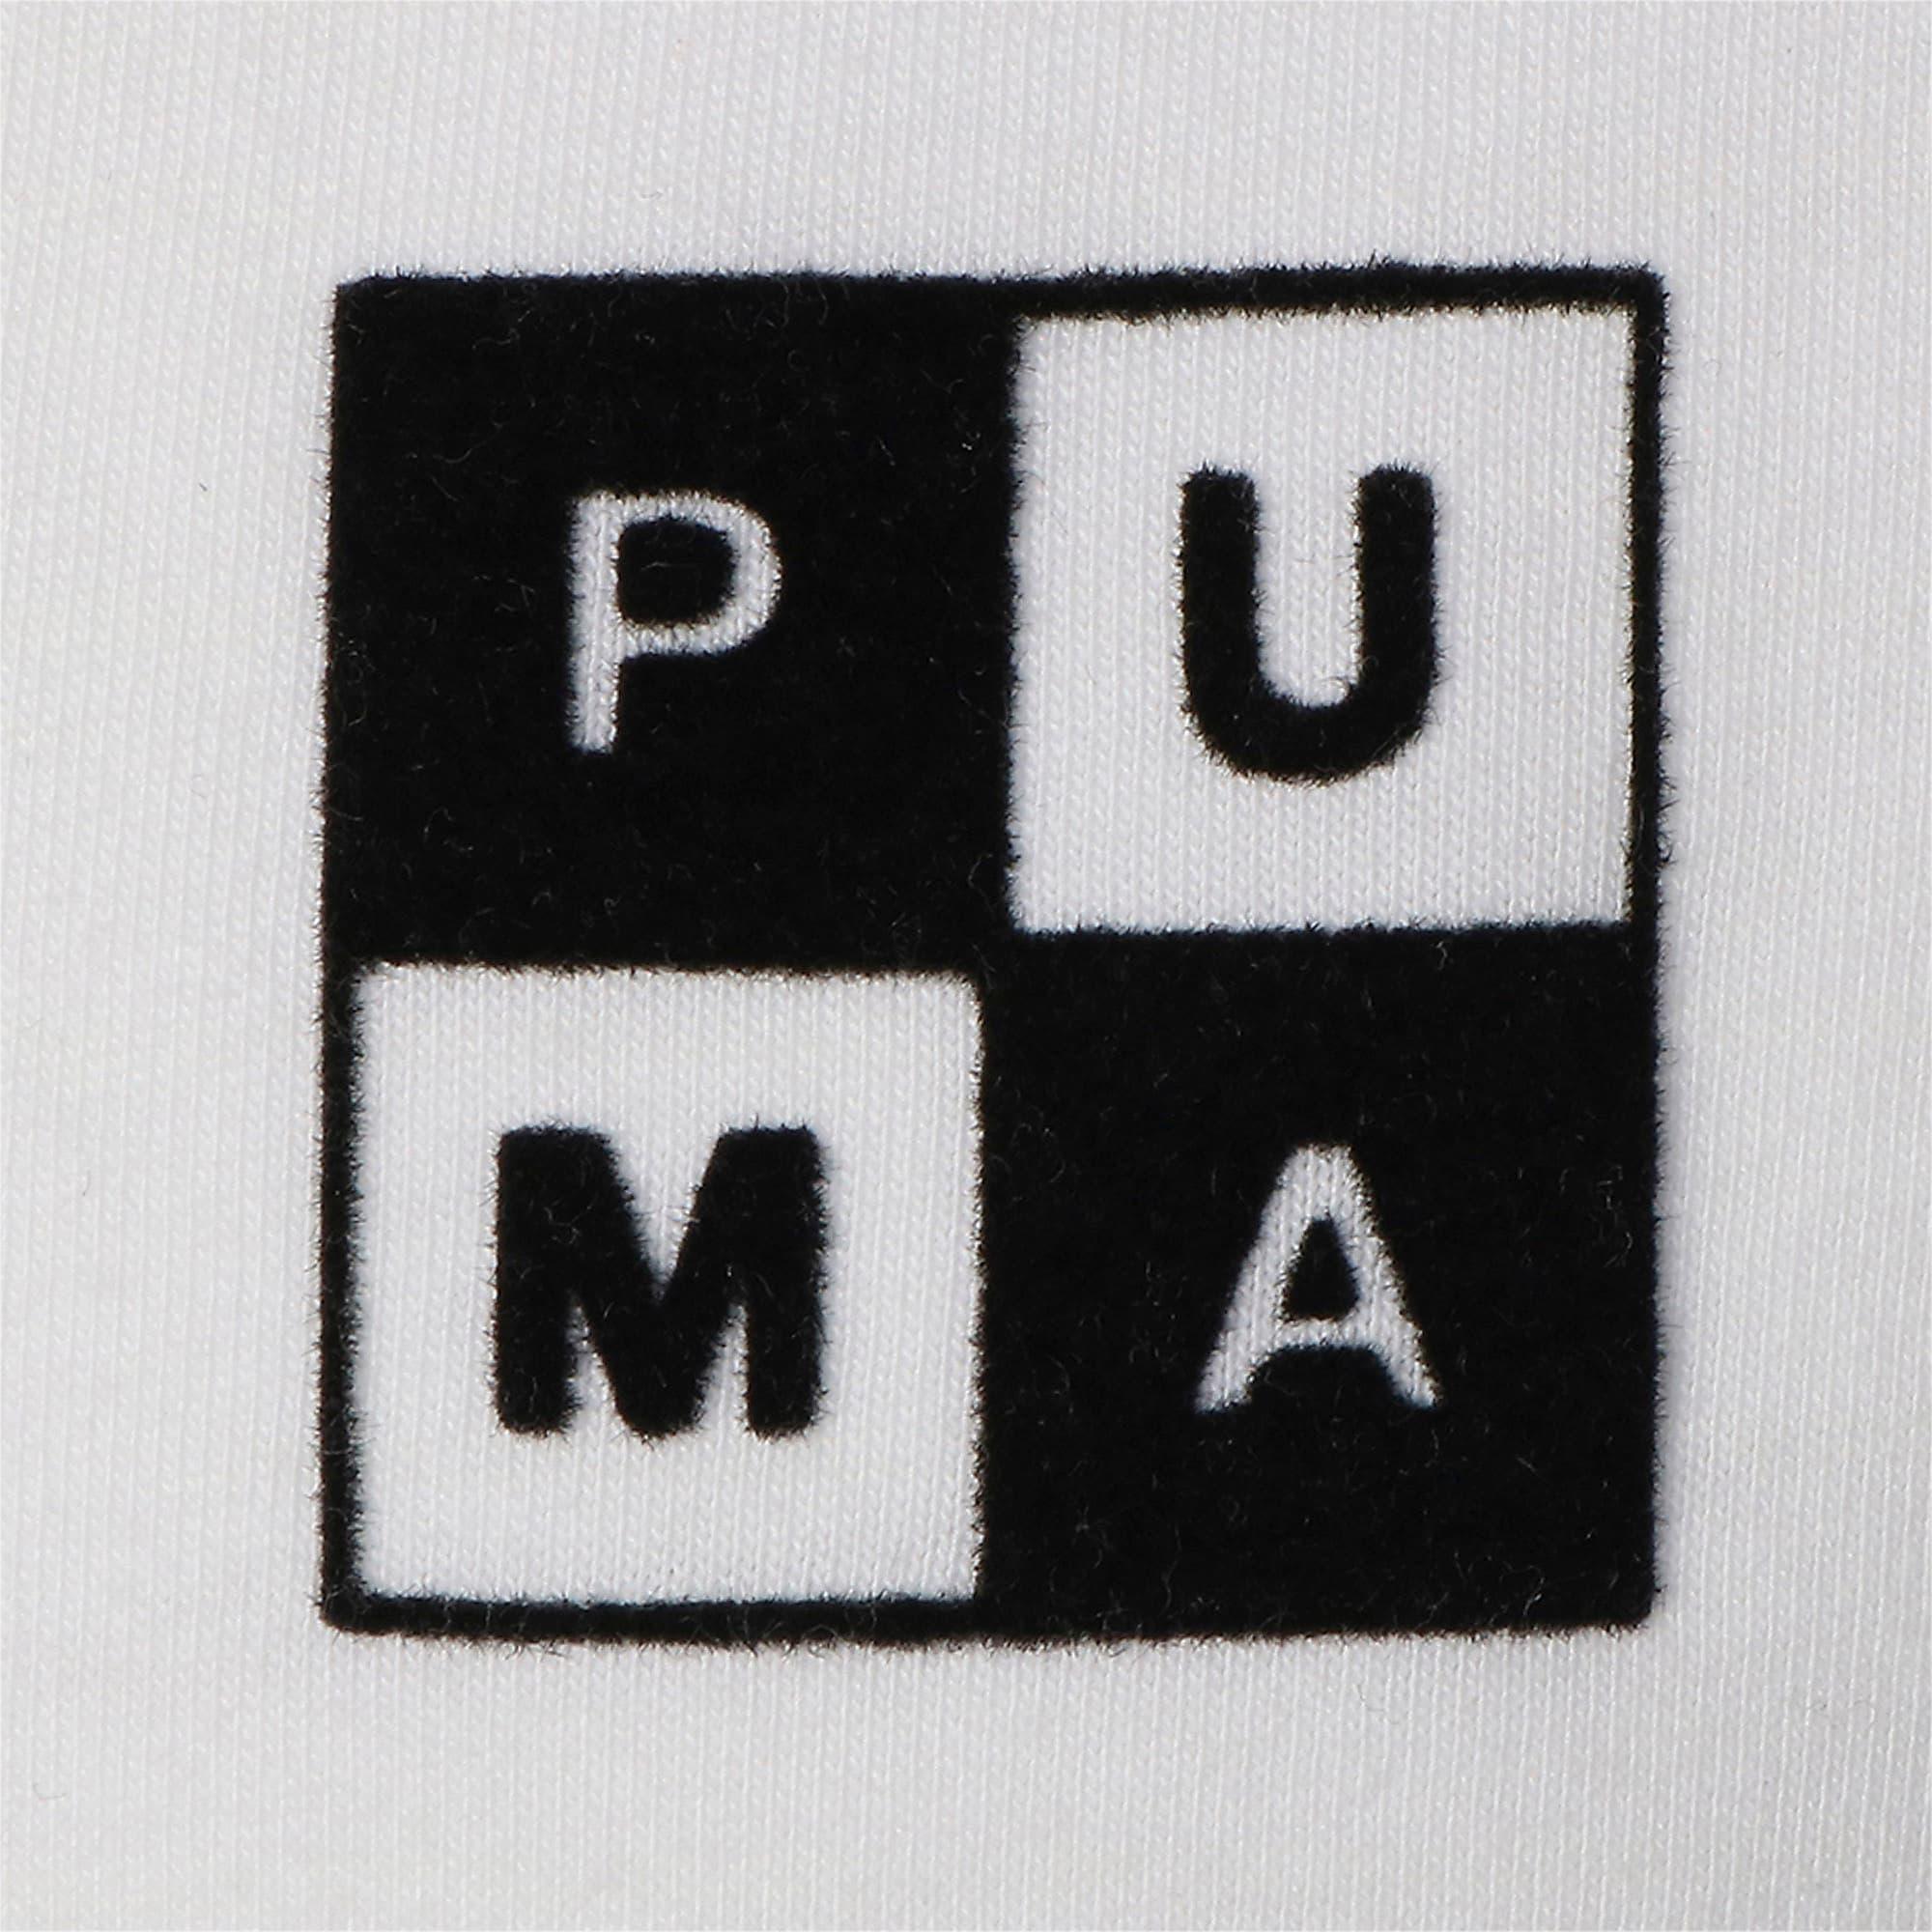 Thumbnail 3 of CHECKBOARD TEE, Puma White, medium-JPN